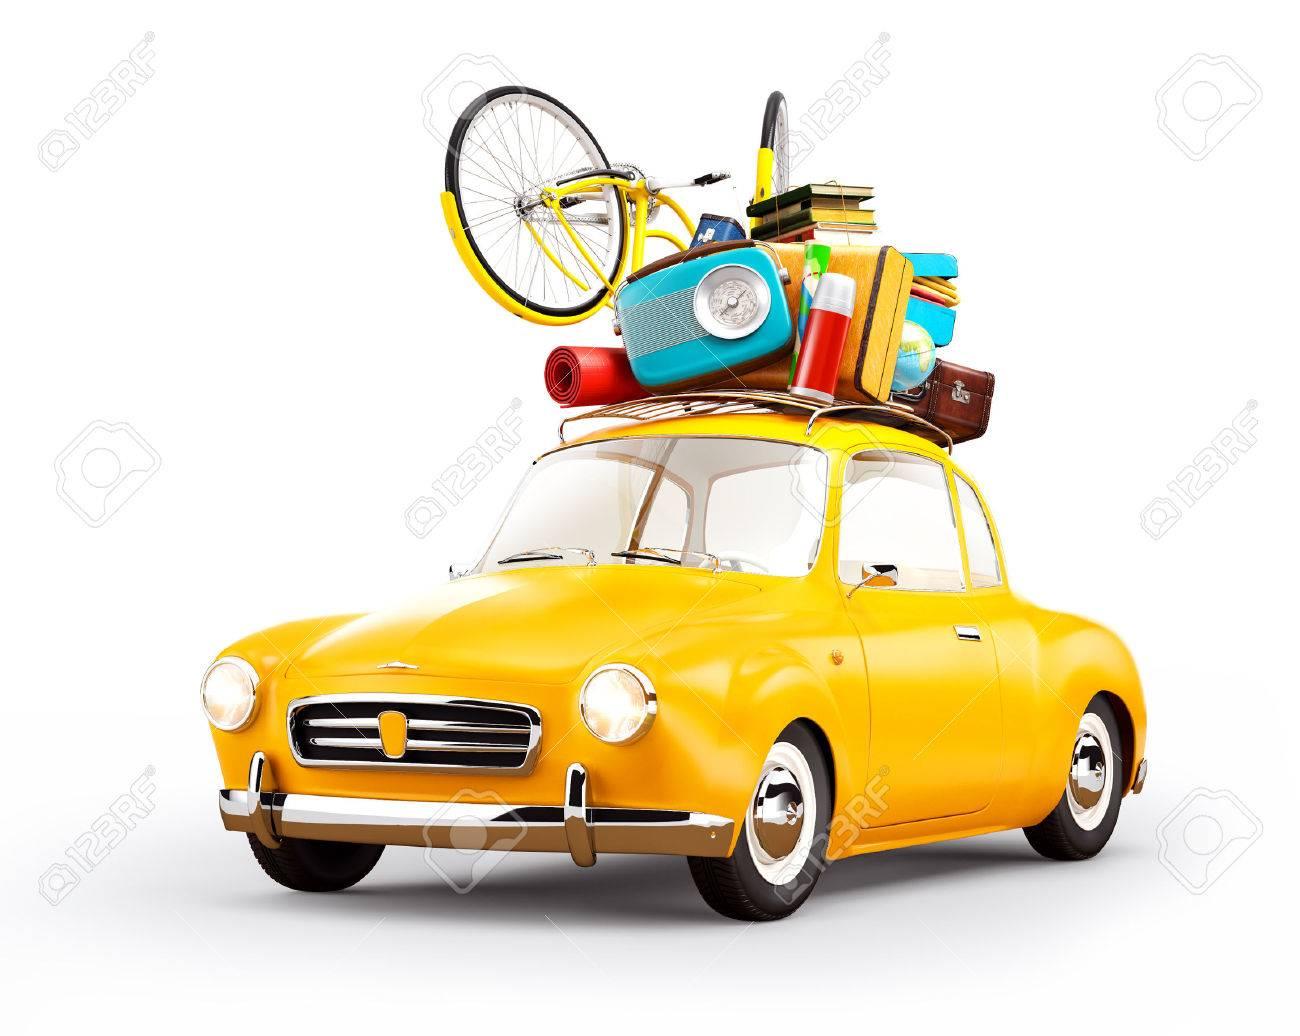 Retro car with luggage. Unusual travel illustration. Isolated - 61322204